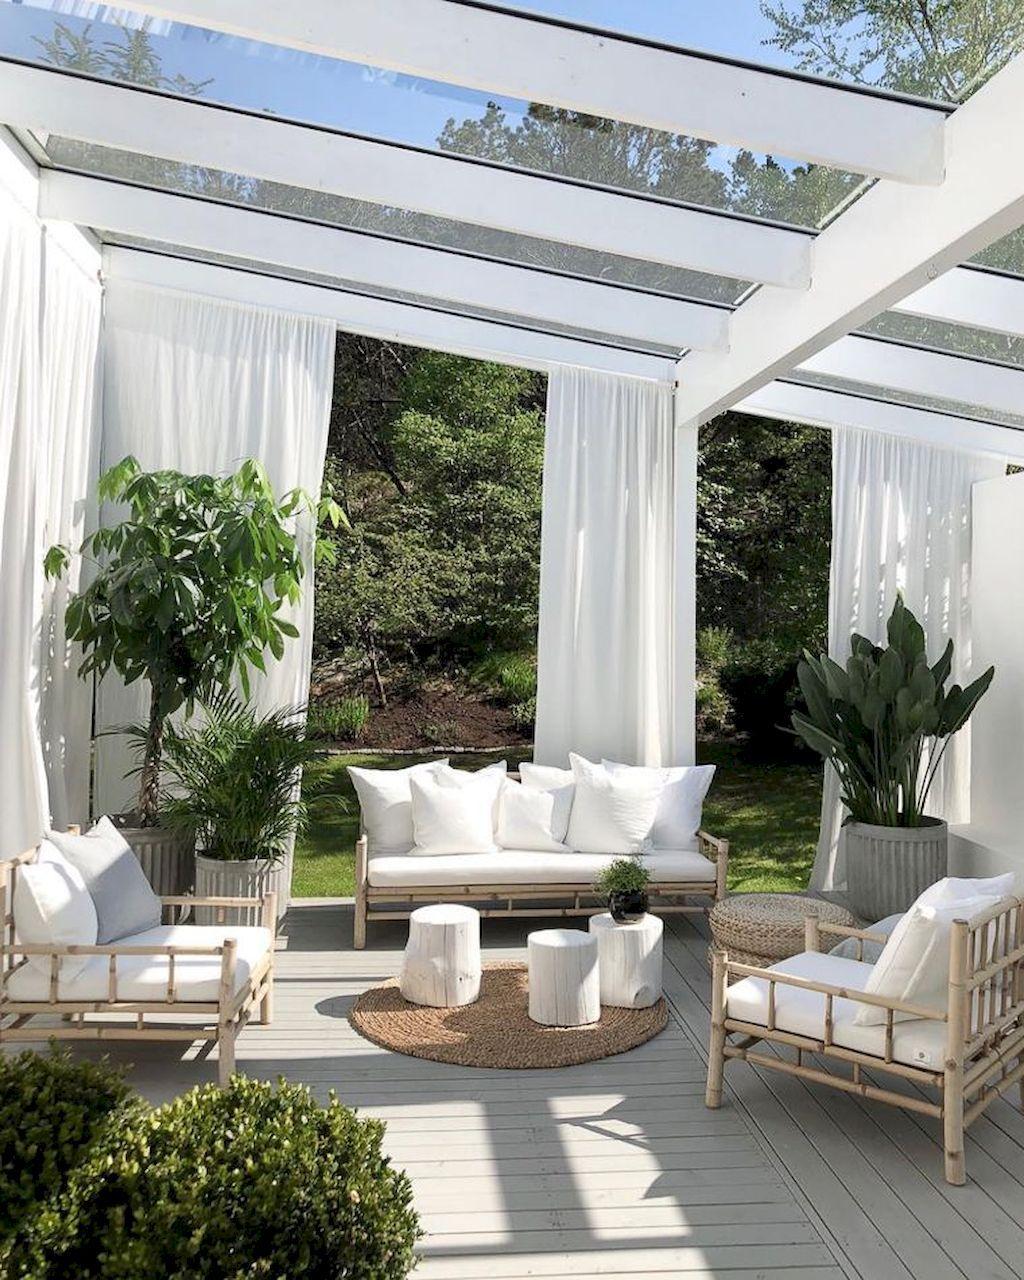 75 Relaxing Summer Backyard Patio Outdoor Seating Ideas #backyardpatiodesigns